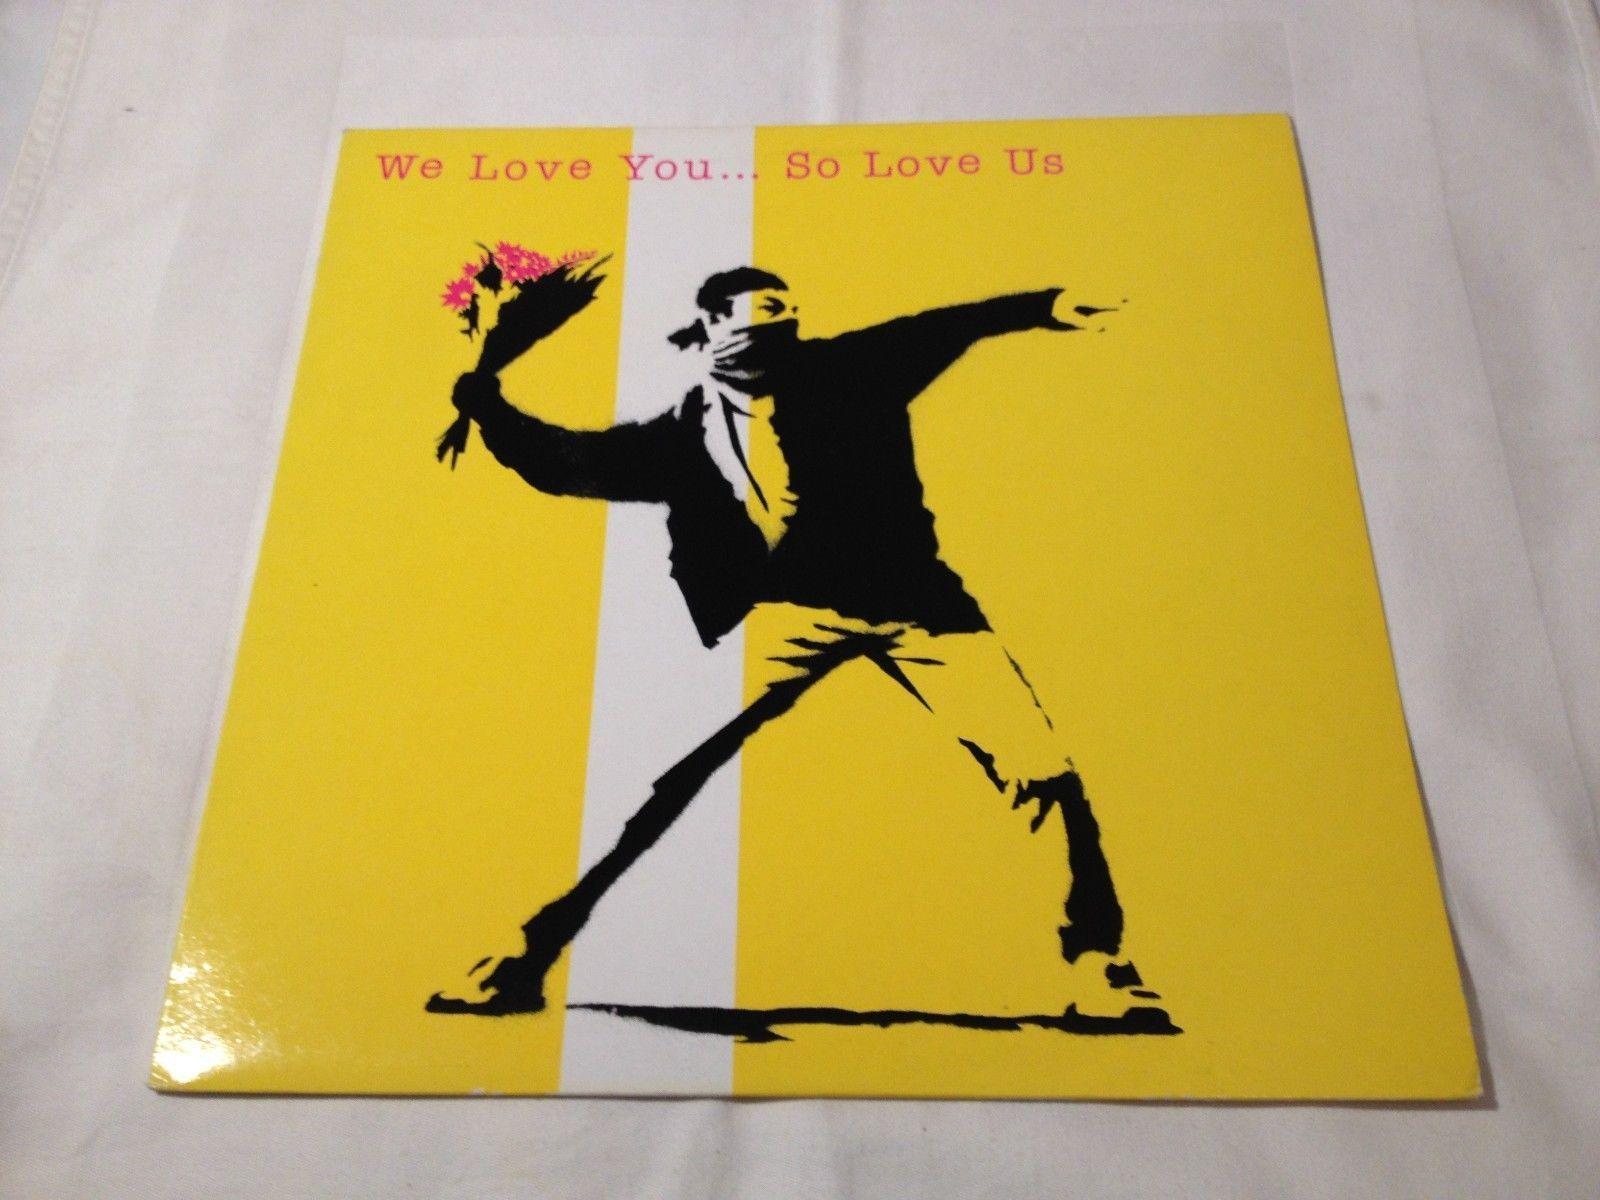 we love you...so love us  LP  barricato  lp vinyl record banksy no wtc palestine